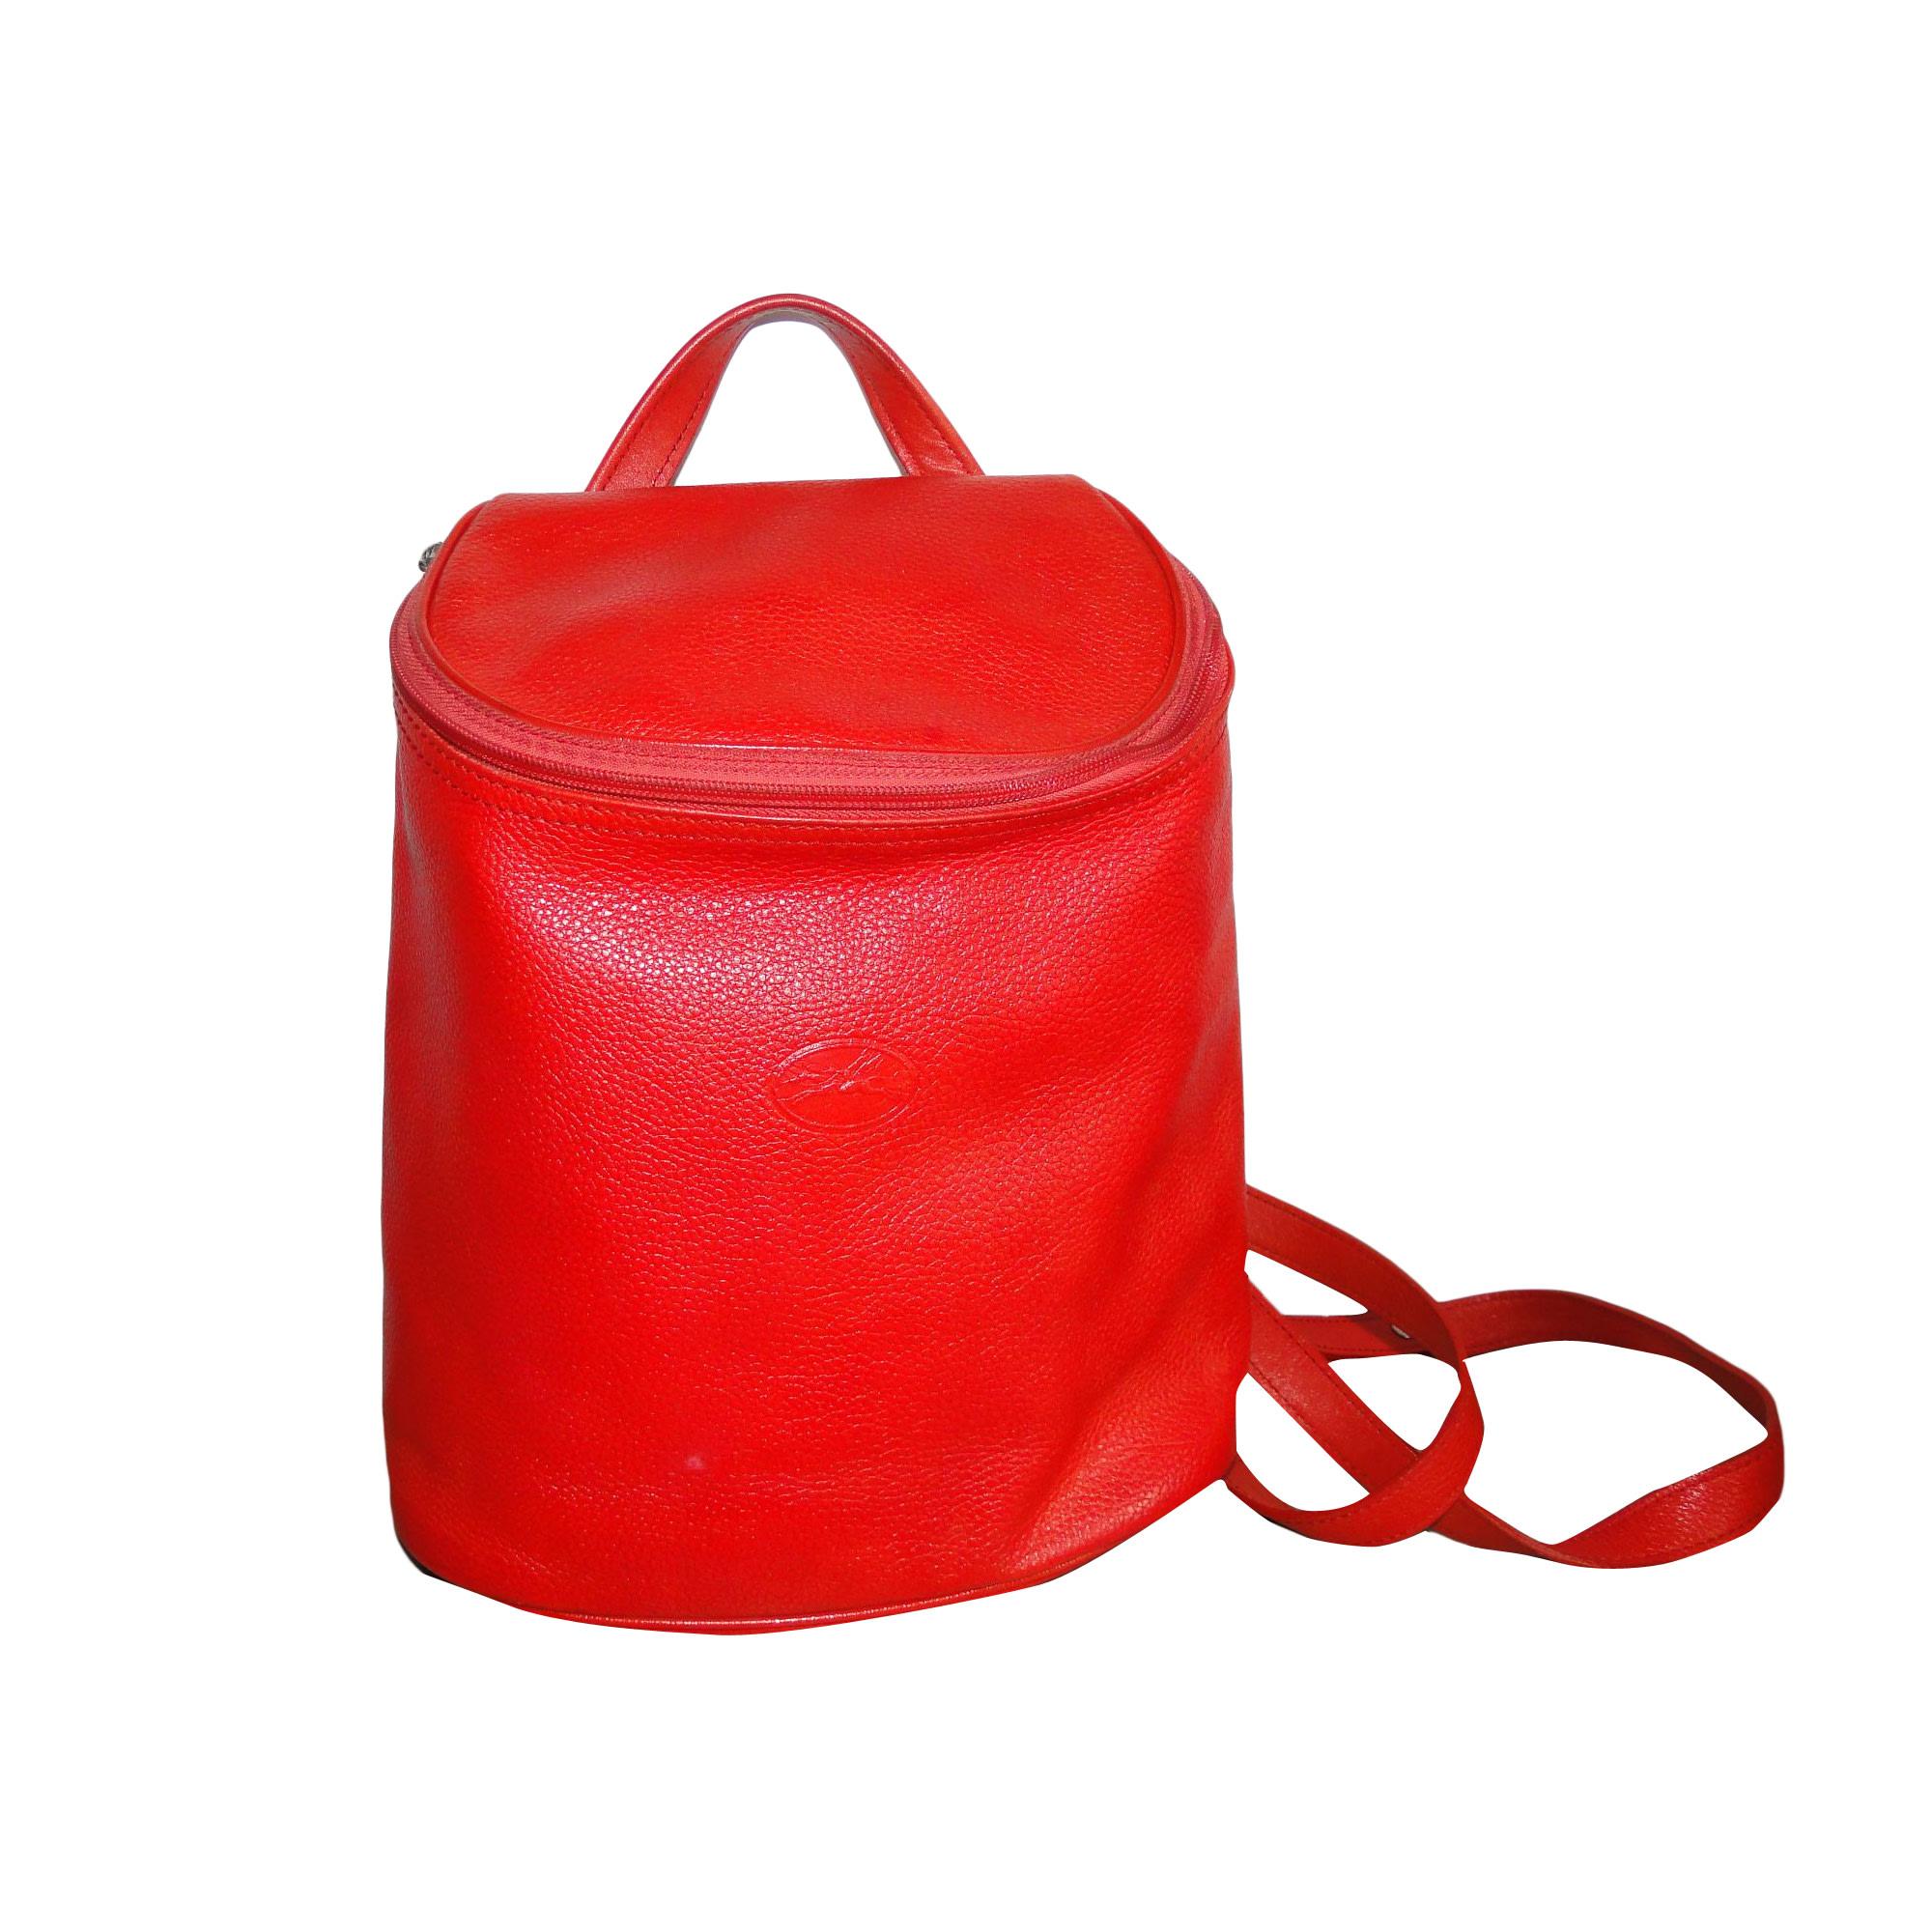 Backpack LONGCHAMP Red, burgundy